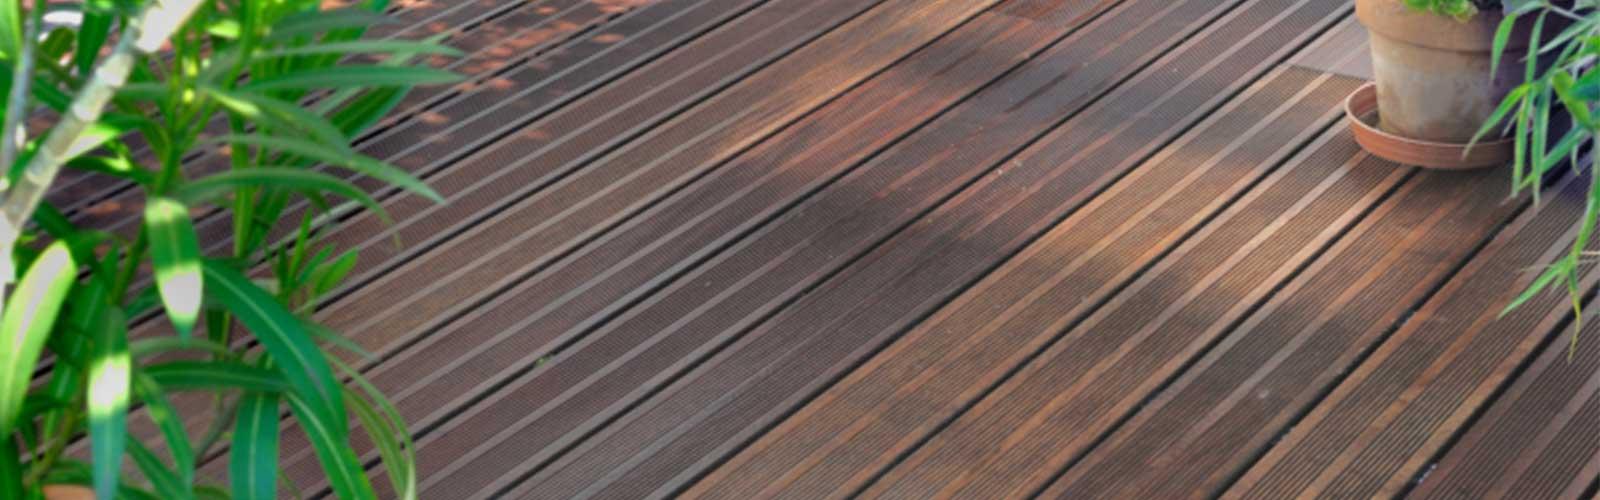 Wooden Terrace Deck